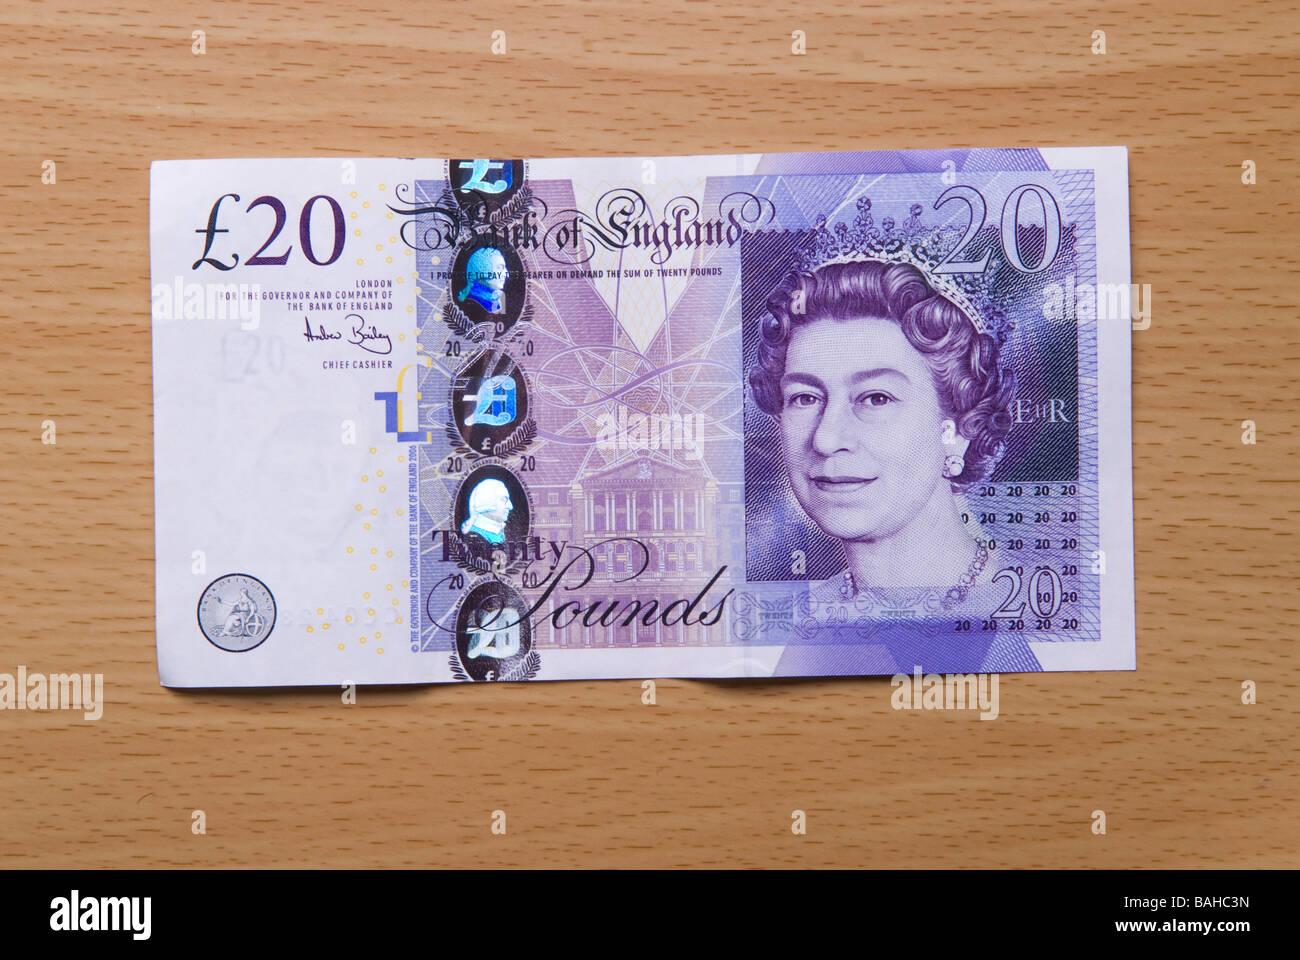 Twenty pounds banknote - Stock Image